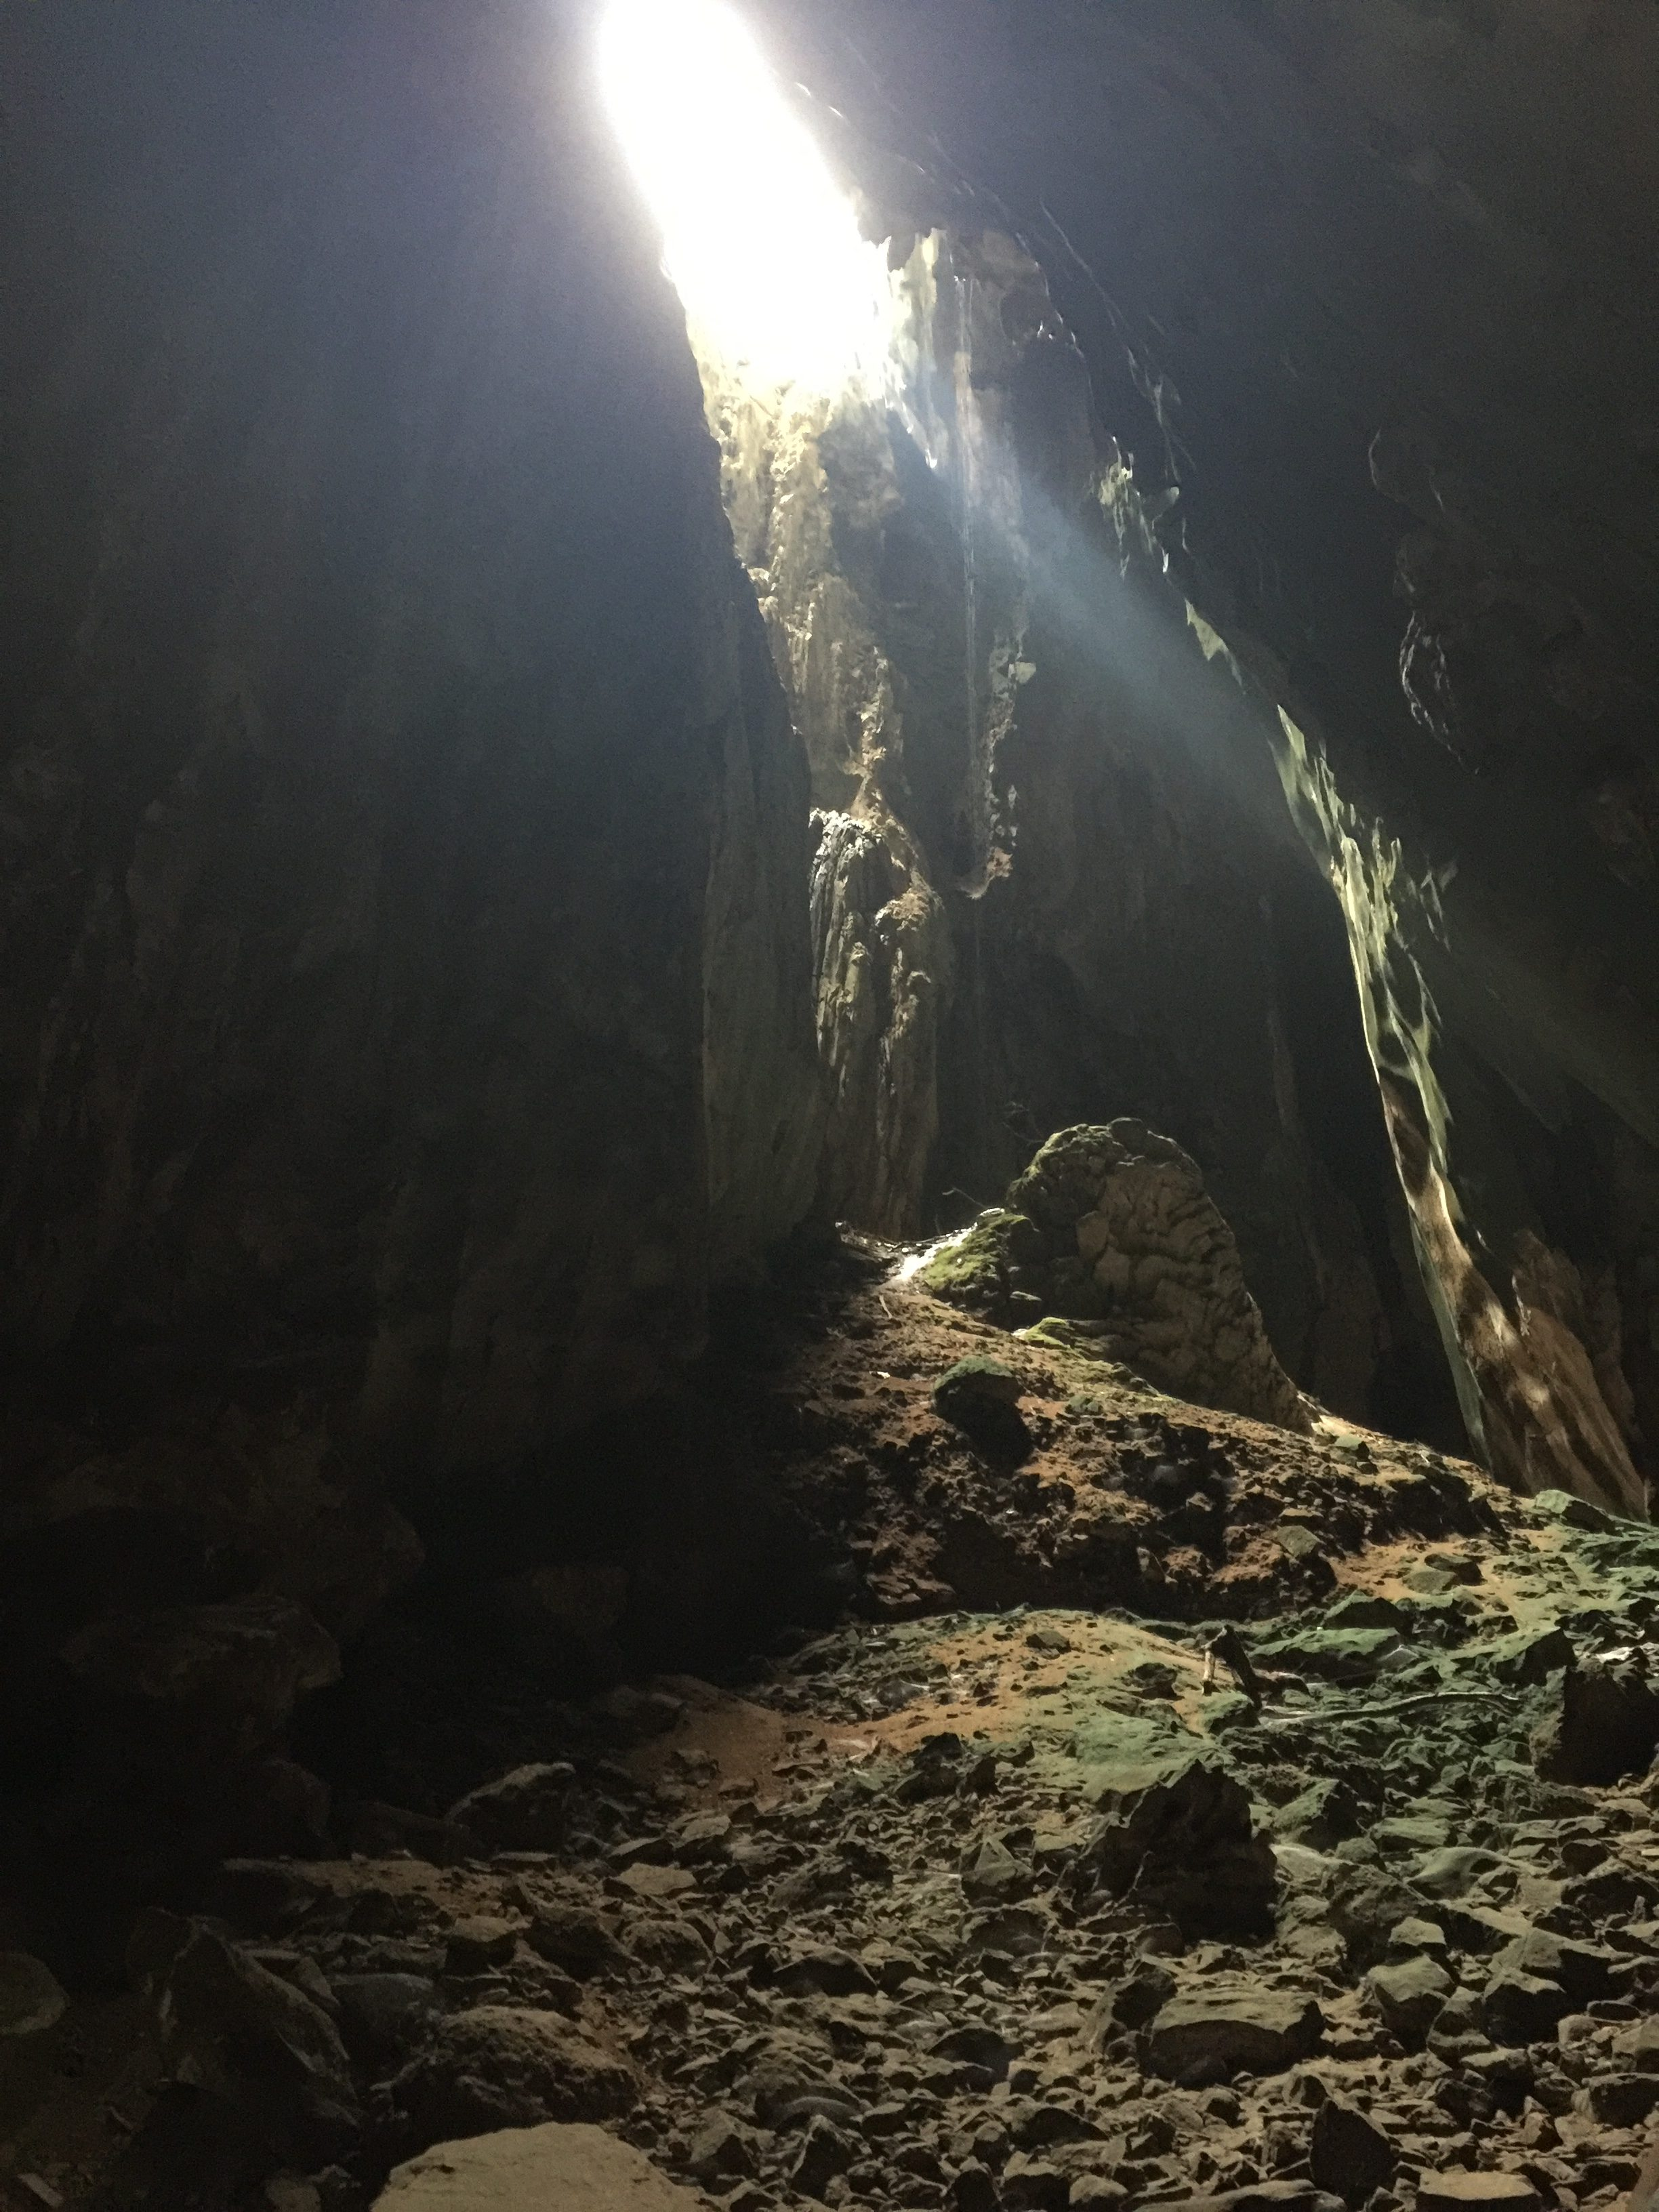 batu caves kuala lumpur kl malaysia